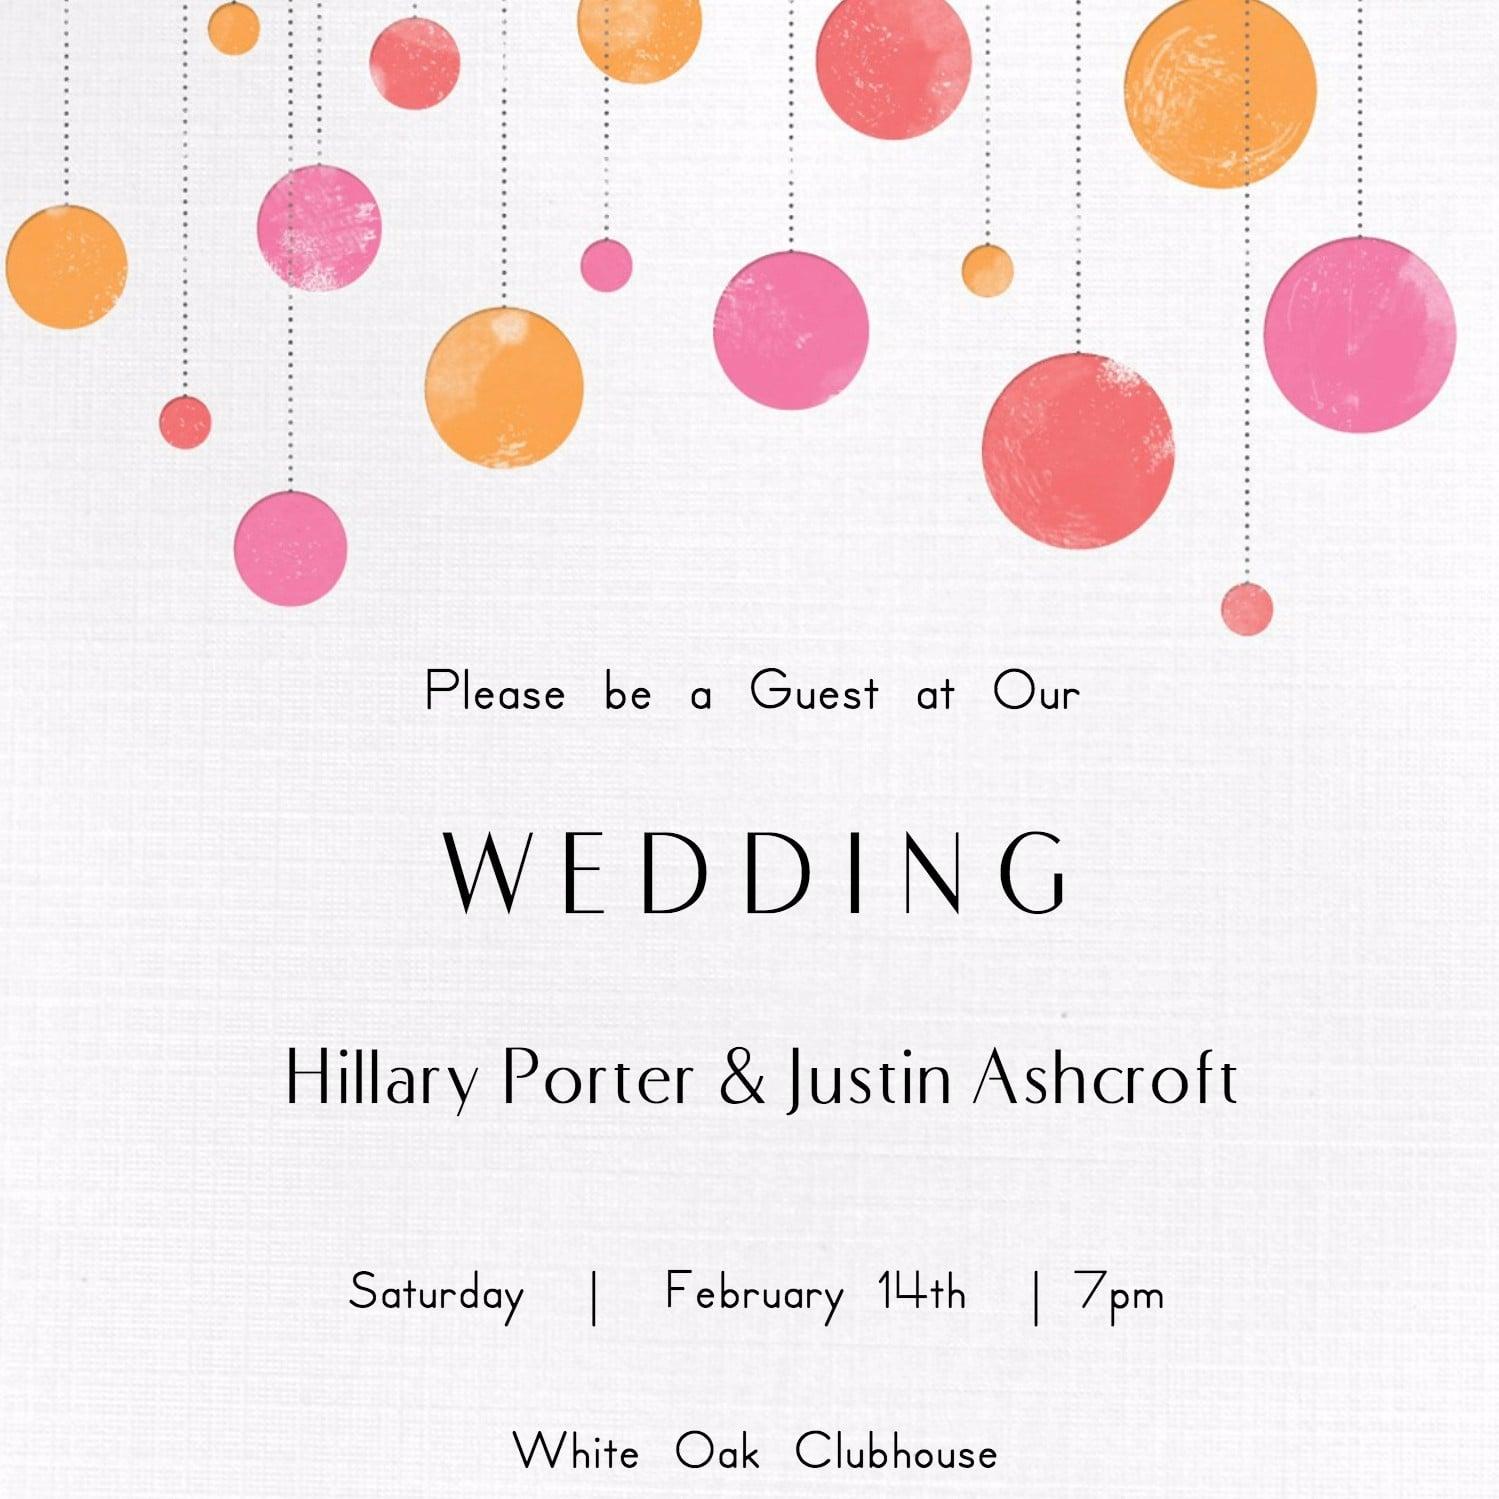 Printable Invitation Card - Rehau.hauteboxx.co - Wedding Invitation Cards Printable Free